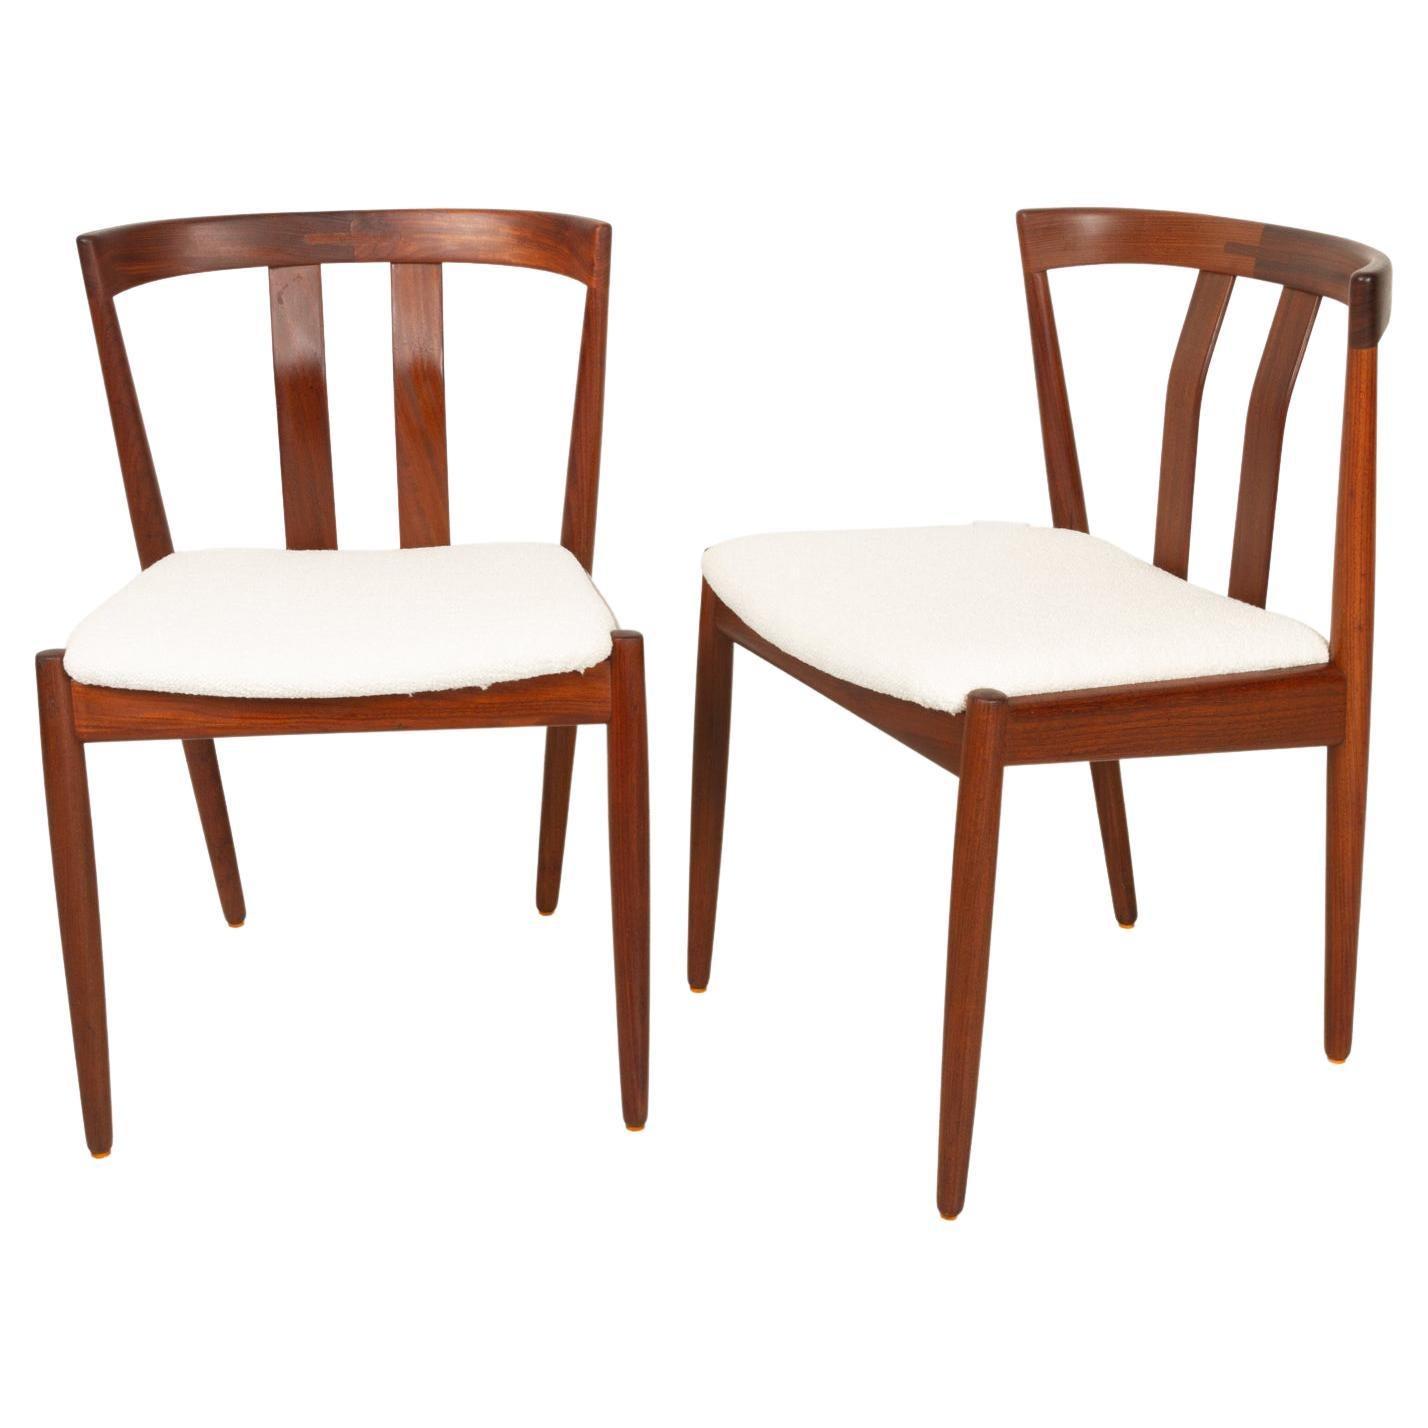 Vintage Danish Teak Dining Chairs 1960s, Set of 2